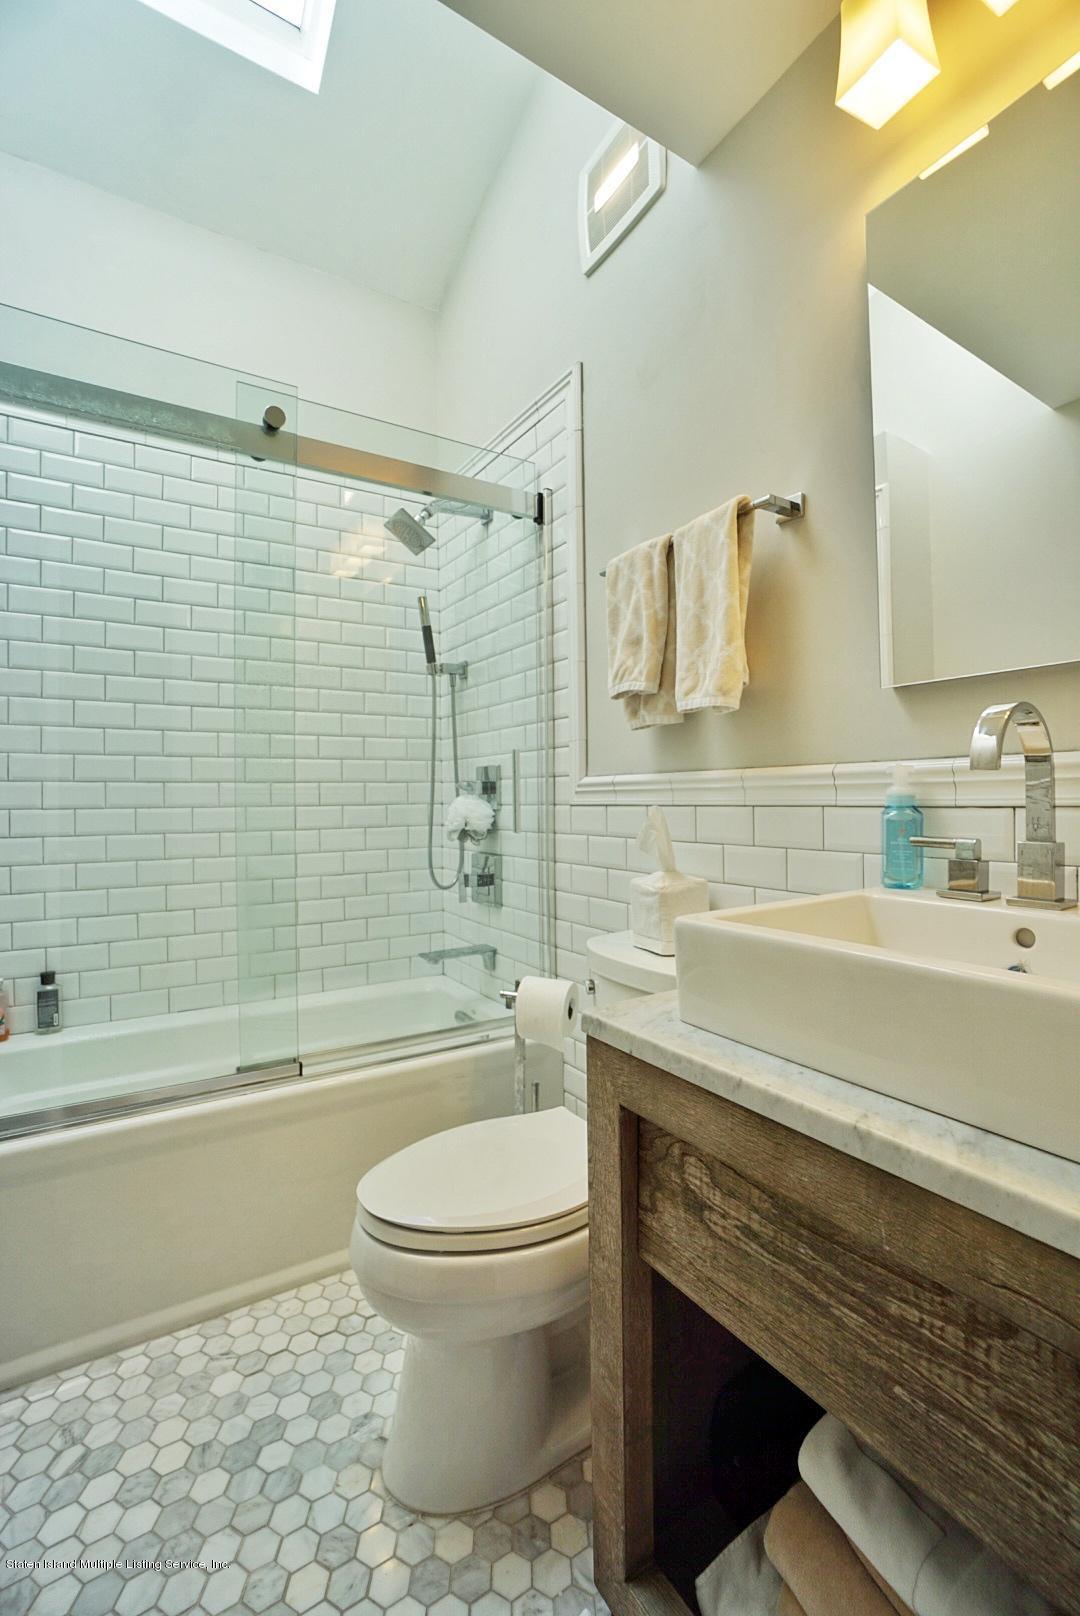 Single Family - Semi-Attached 66 Reading Avenue  Staten Island, NY 10312, MLS-1132256-16